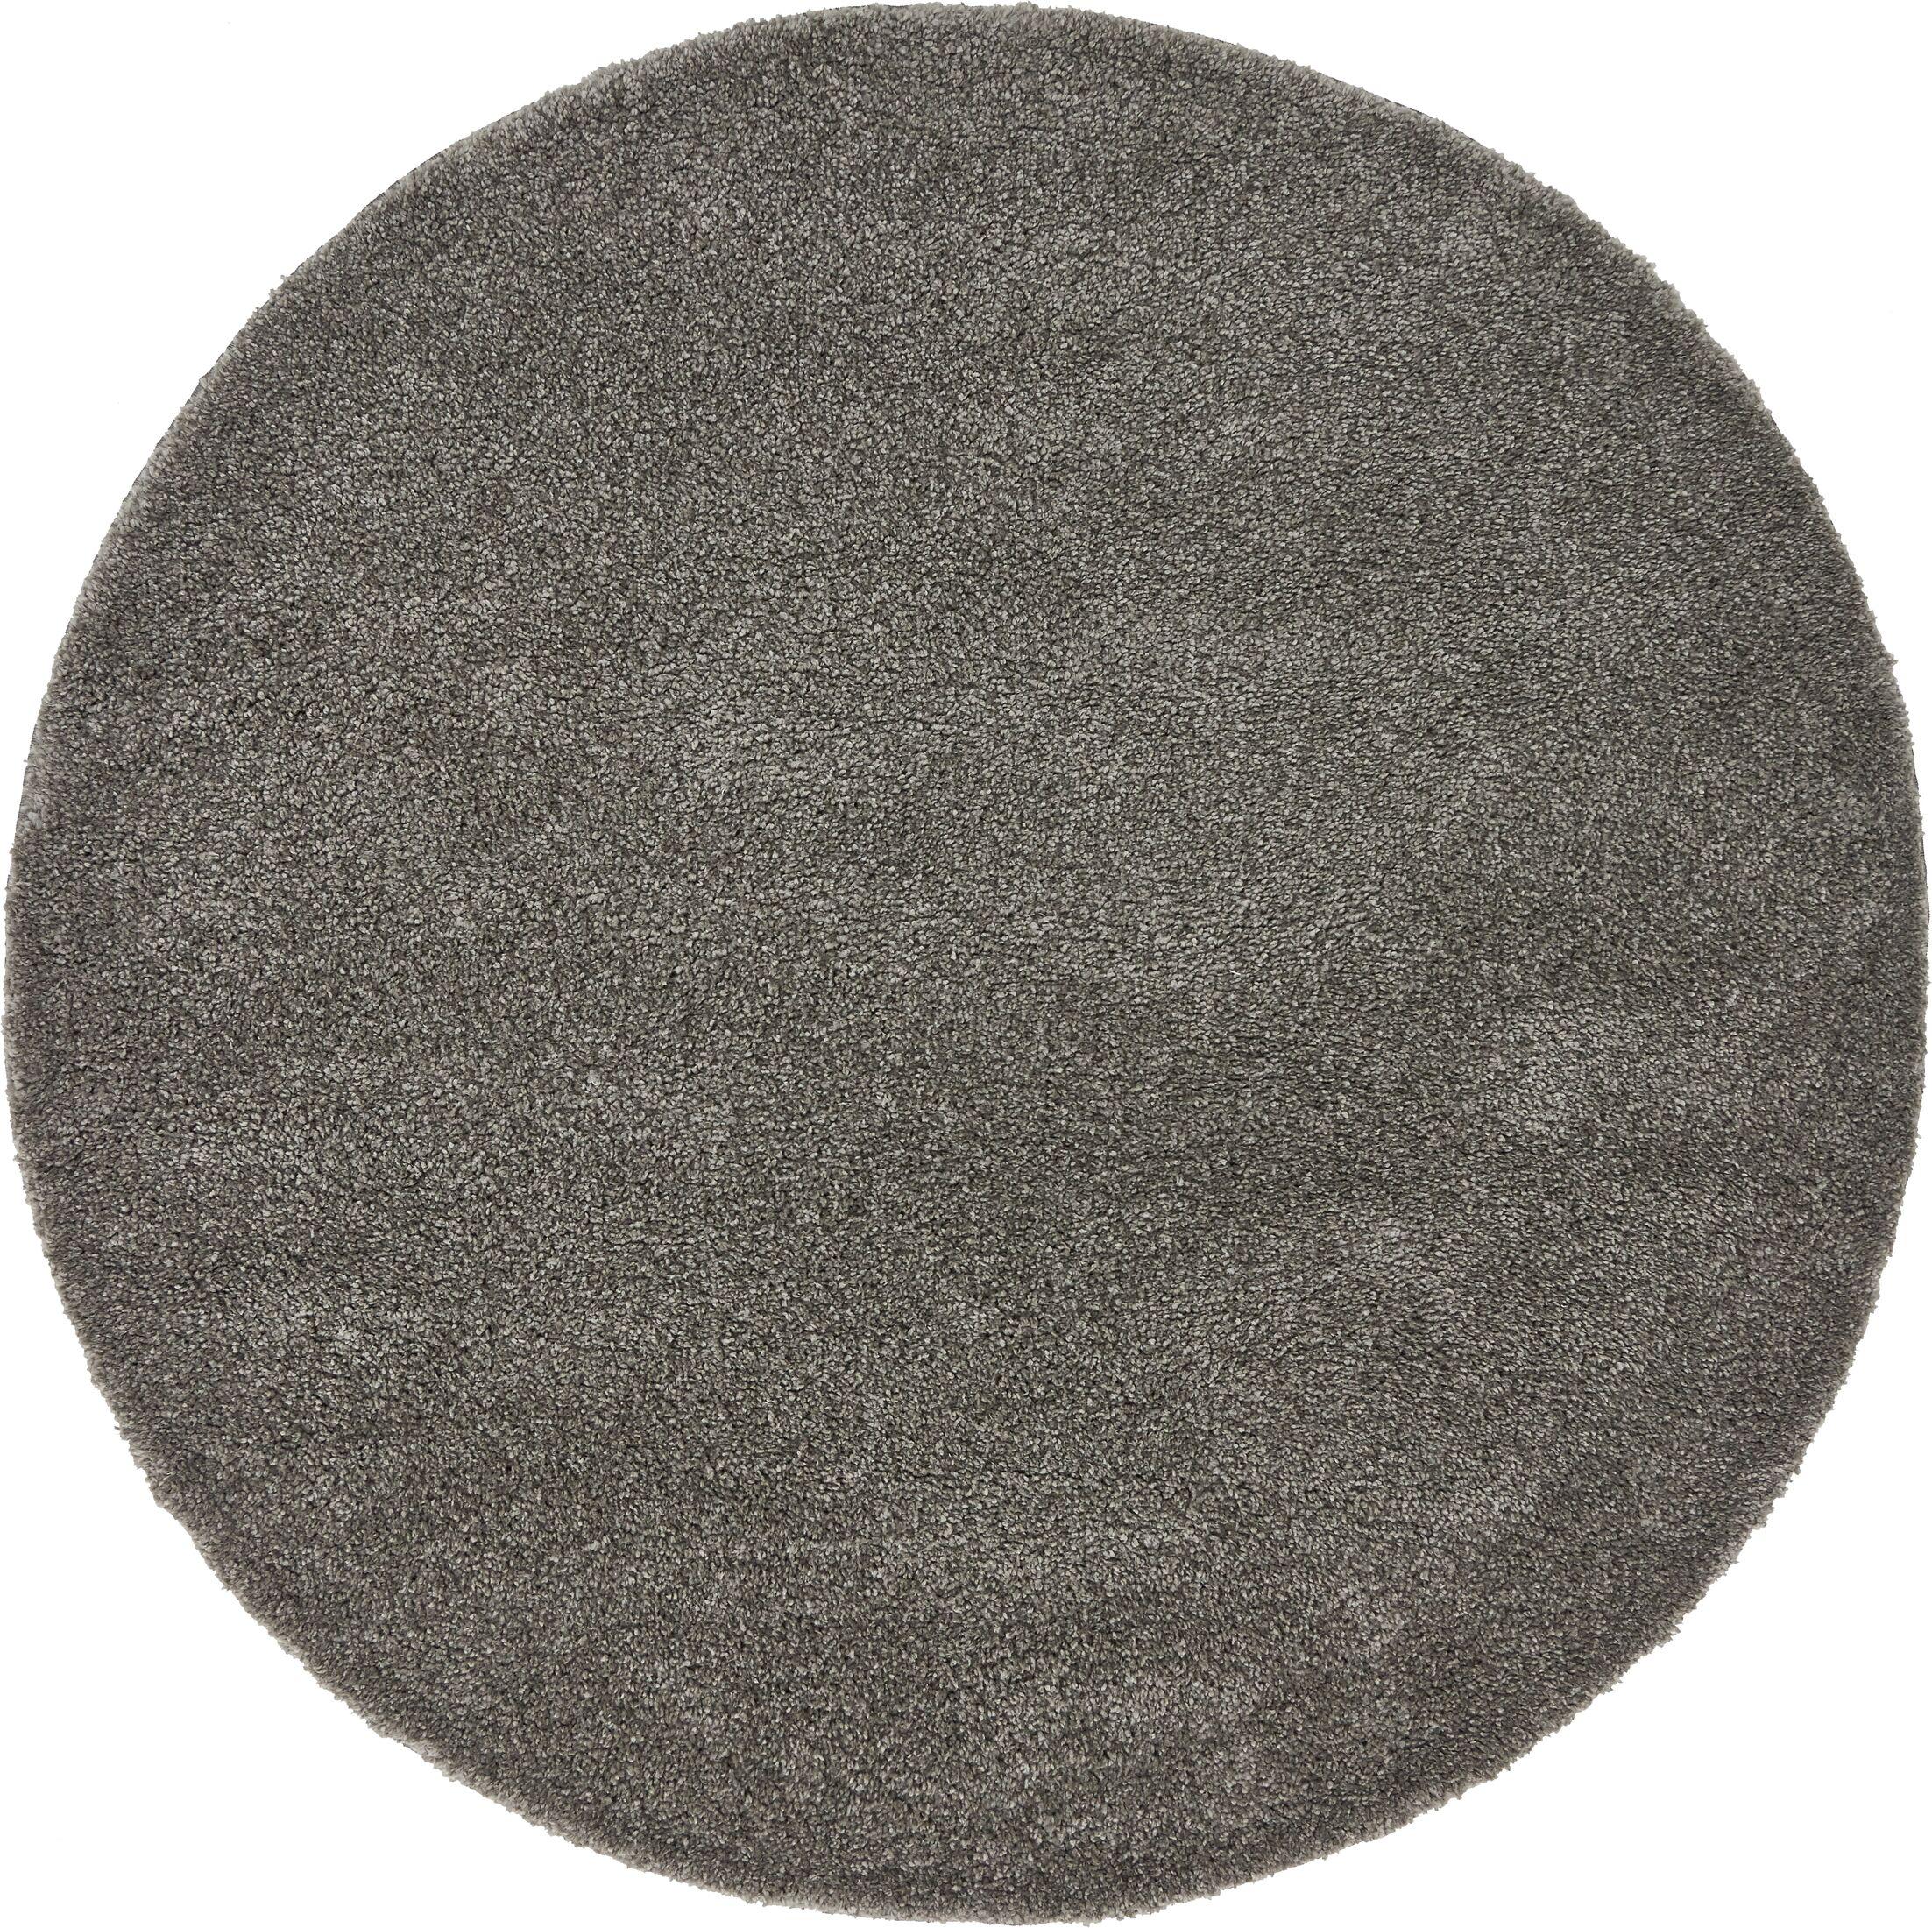 Sydnee Gray Area Rug Rug Size: Round 8'